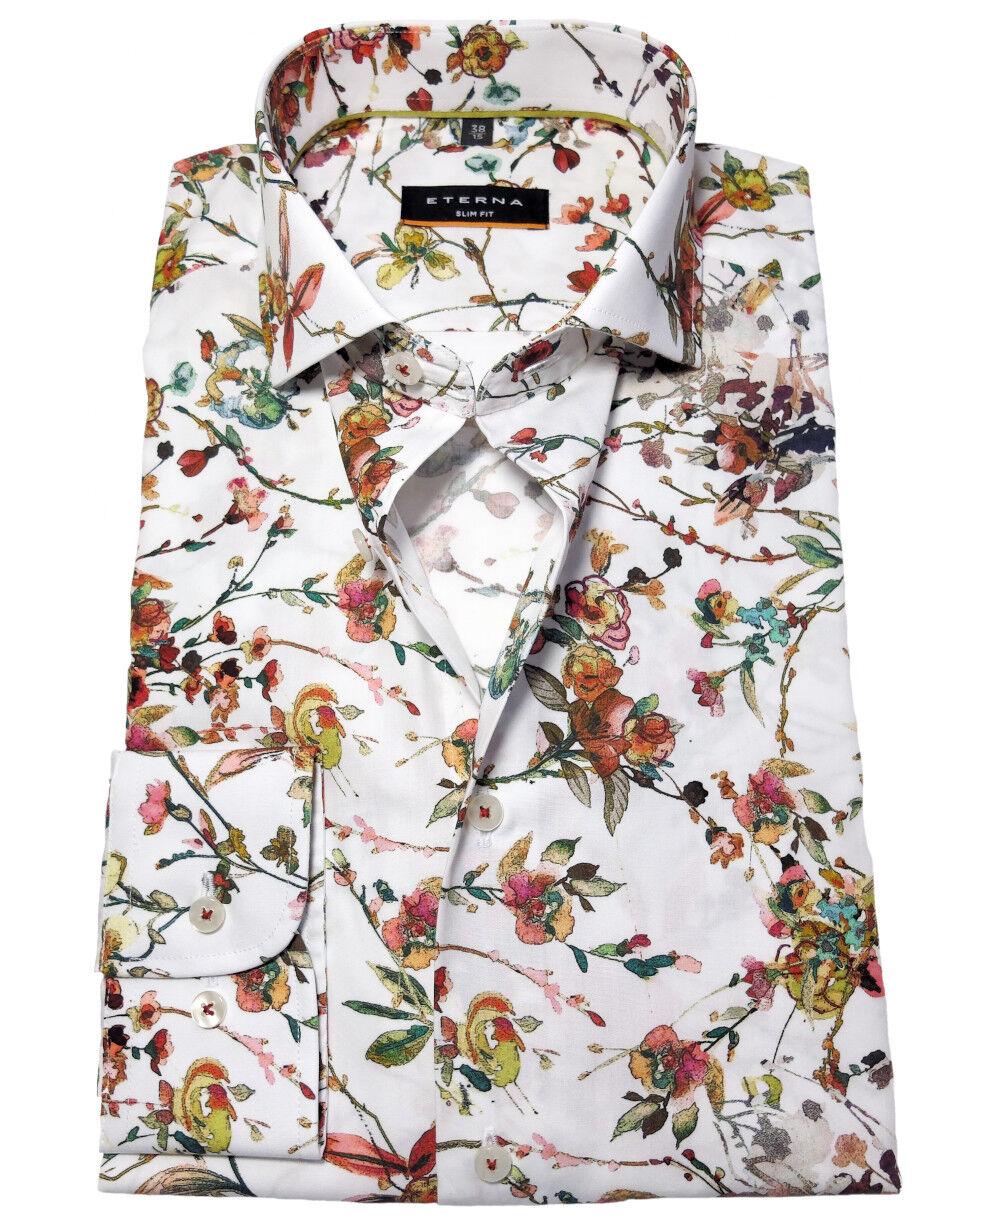 Langarmhemd eterna Slim Fit Floraldesign in weiss bunt Gr. 38 bis 44